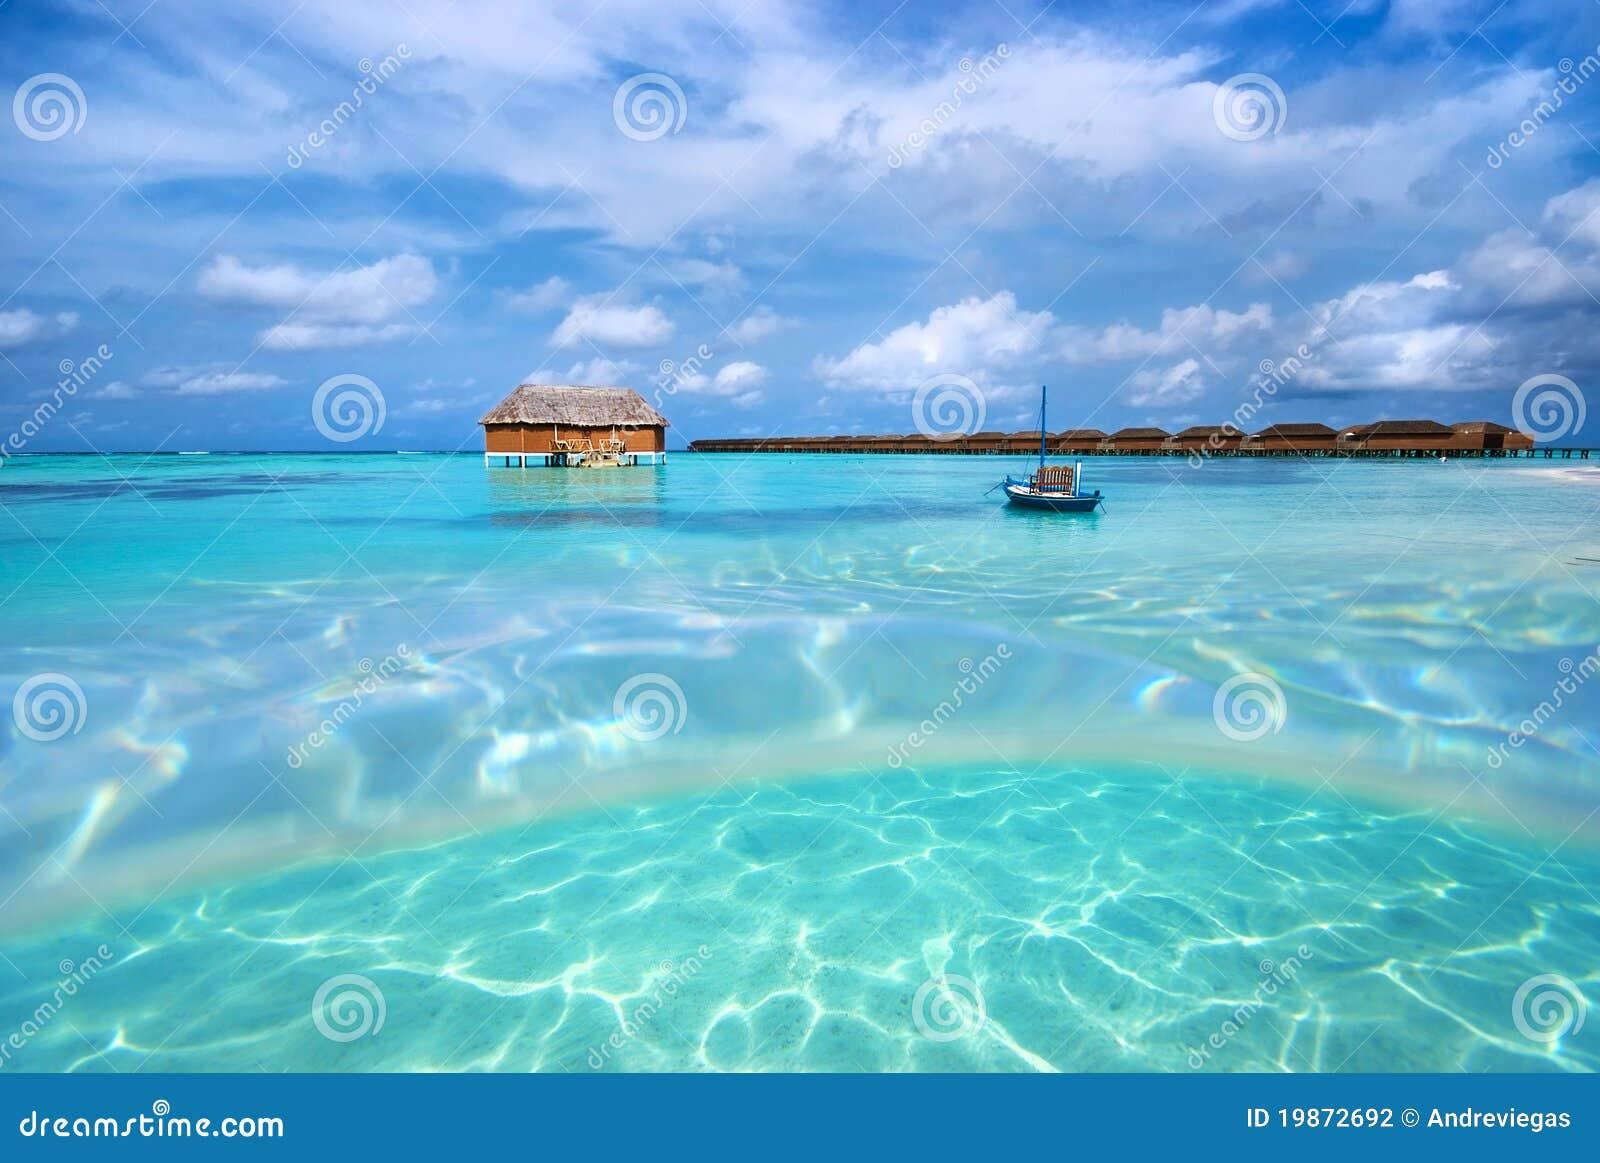 Beach Landscape Maldives Stock Photography Image 19872692